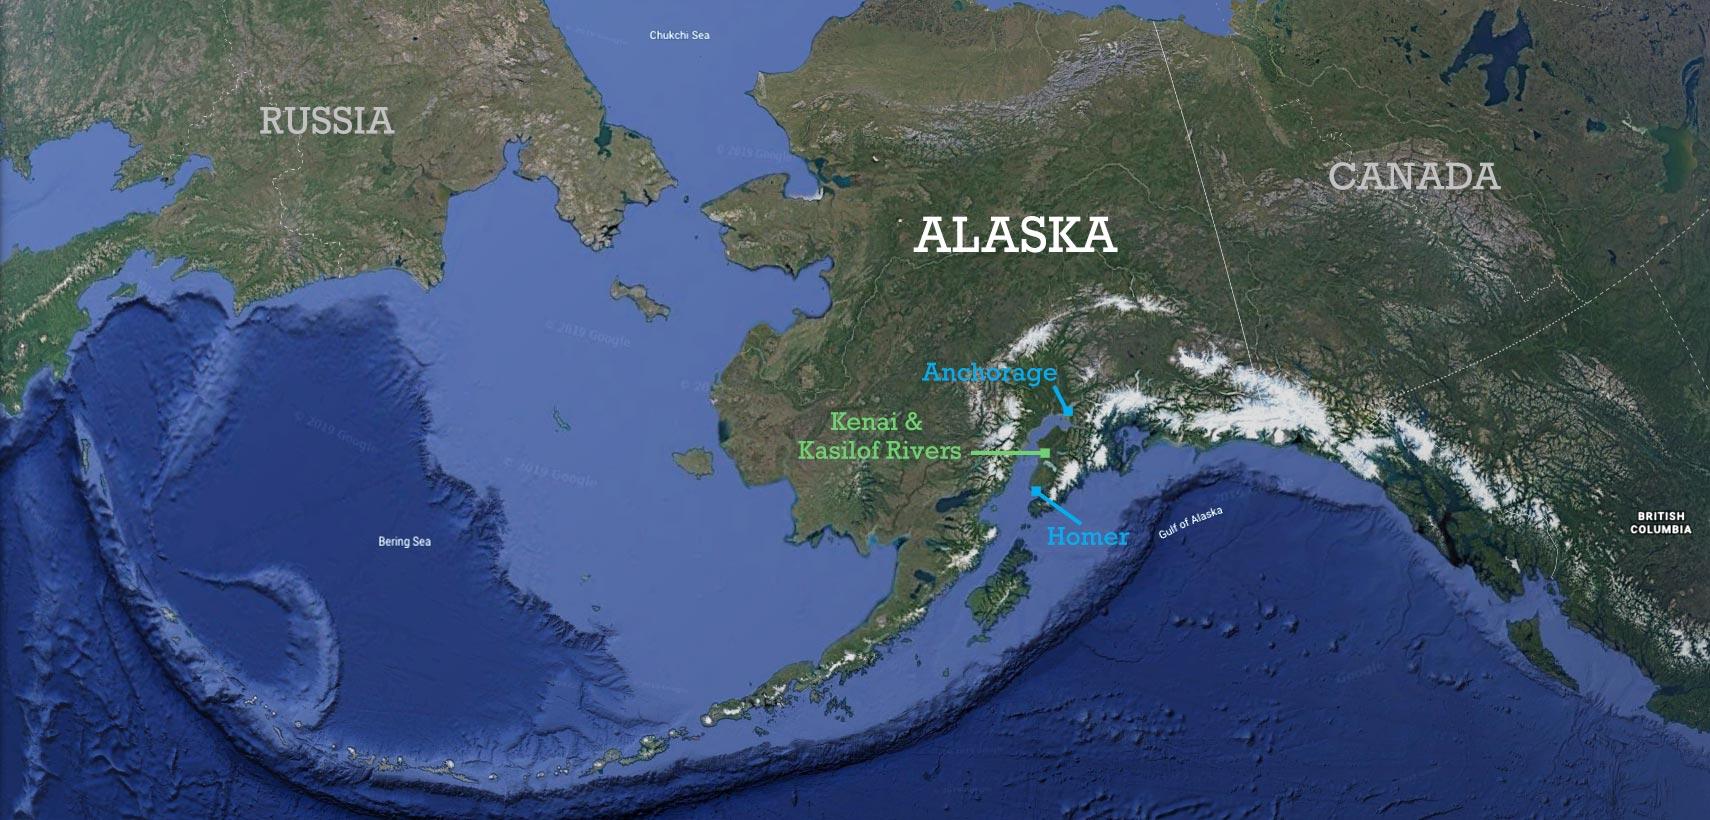 Map of Alaska showing location of the Kenai and Kasilof Rivers